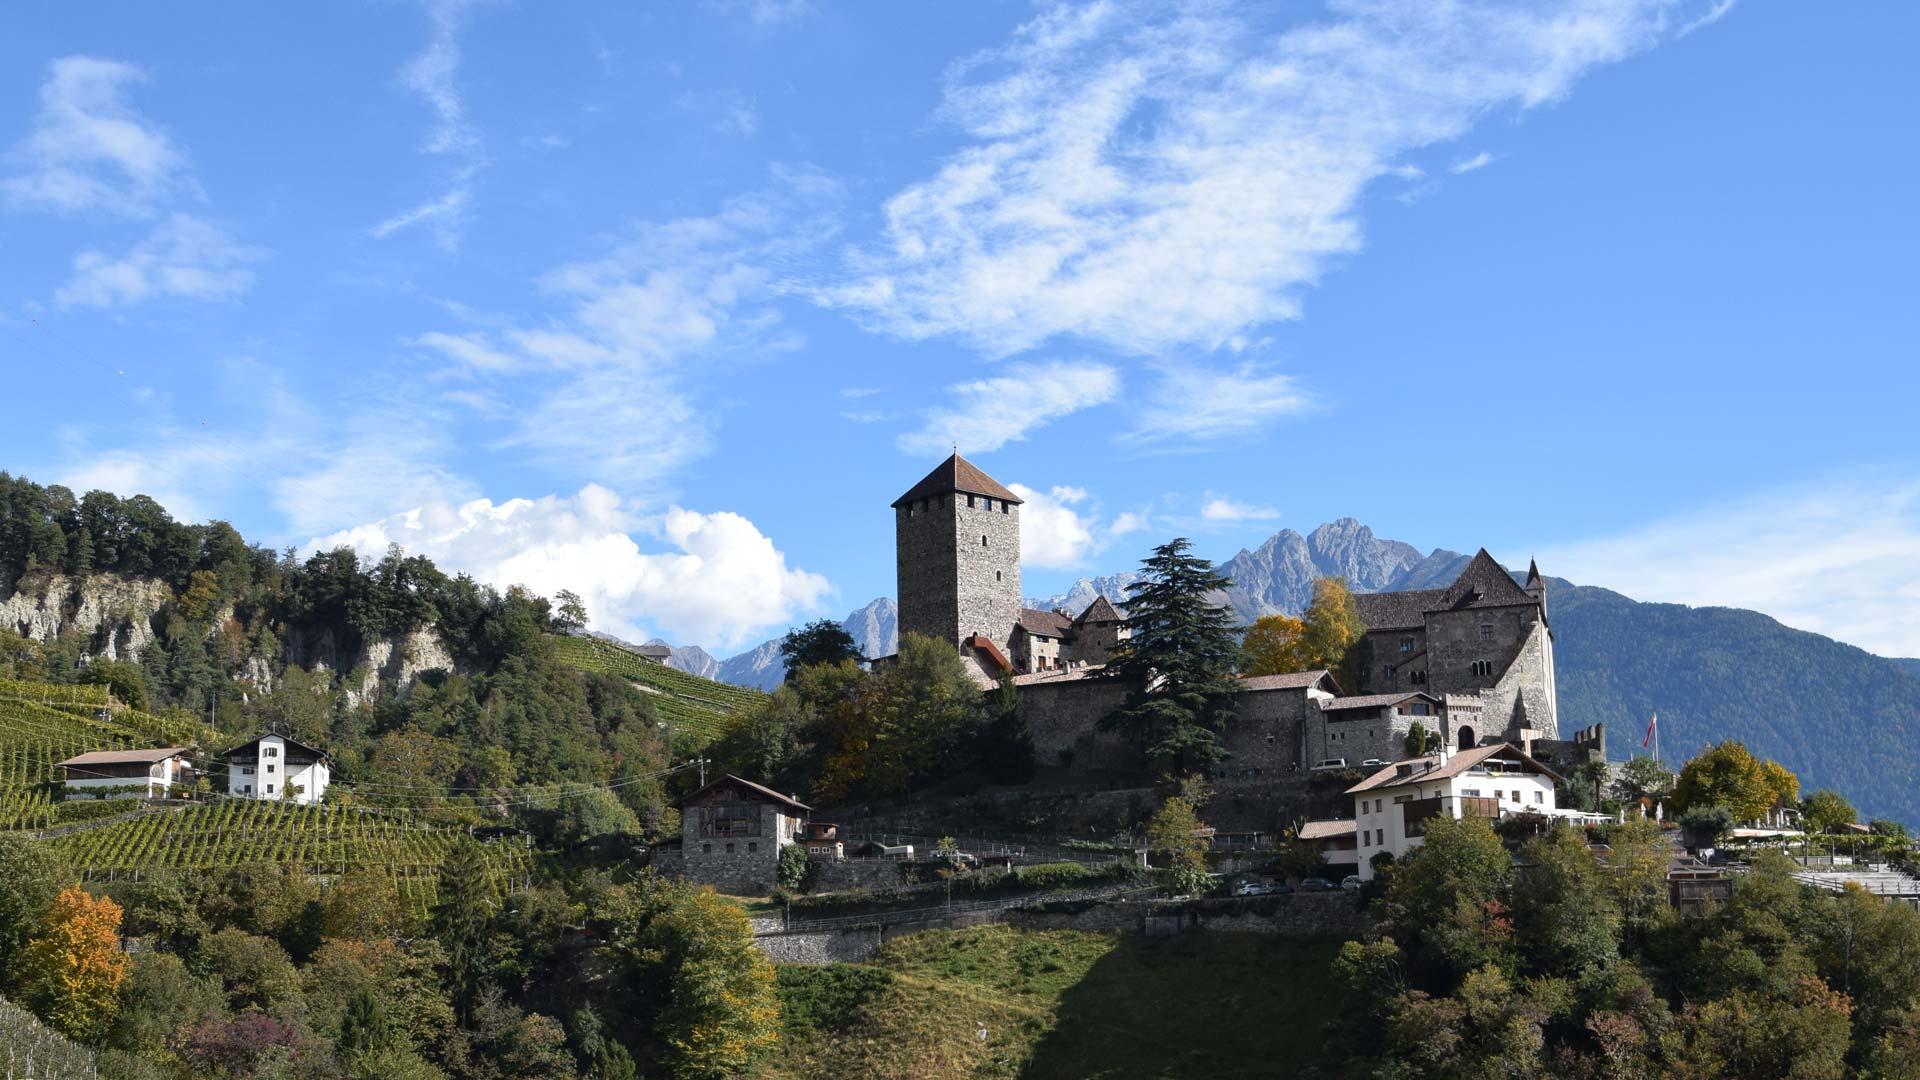 Hotel Dorf Tirol St Peter